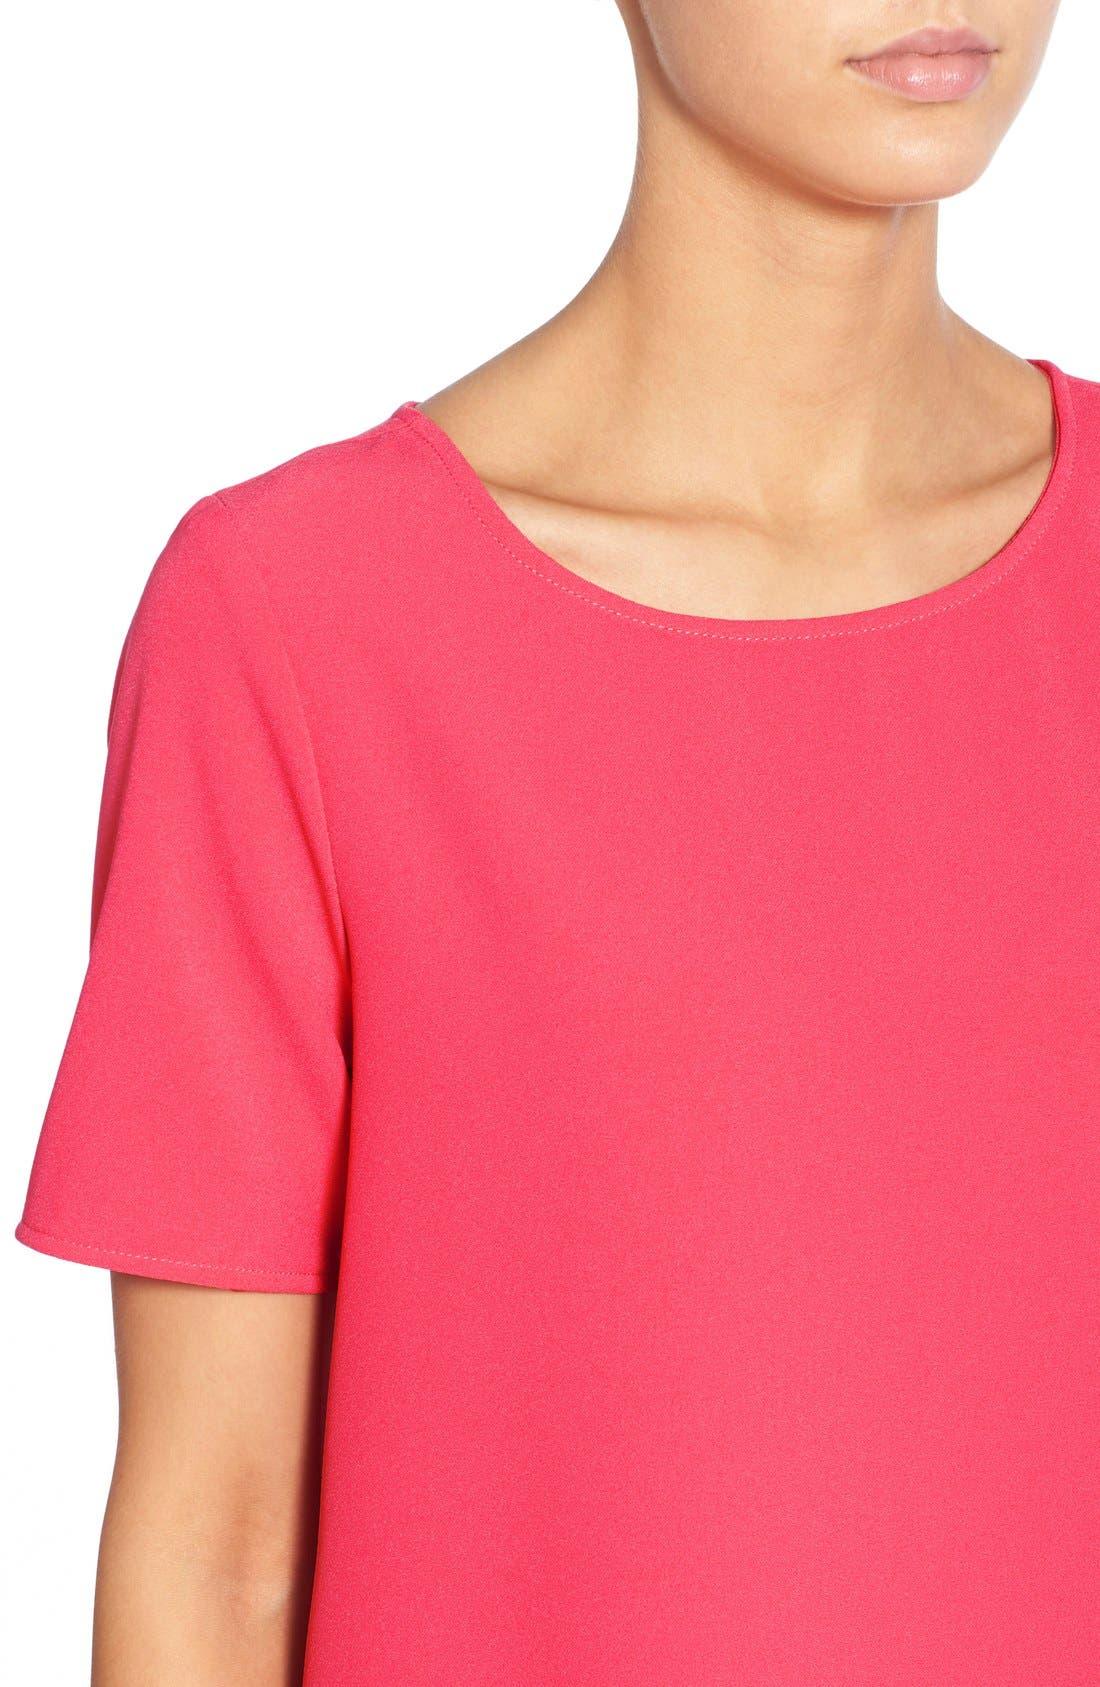 'Magnolia' Shift Dress,                             Alternate thumbnail 4, color,                             Flamingo